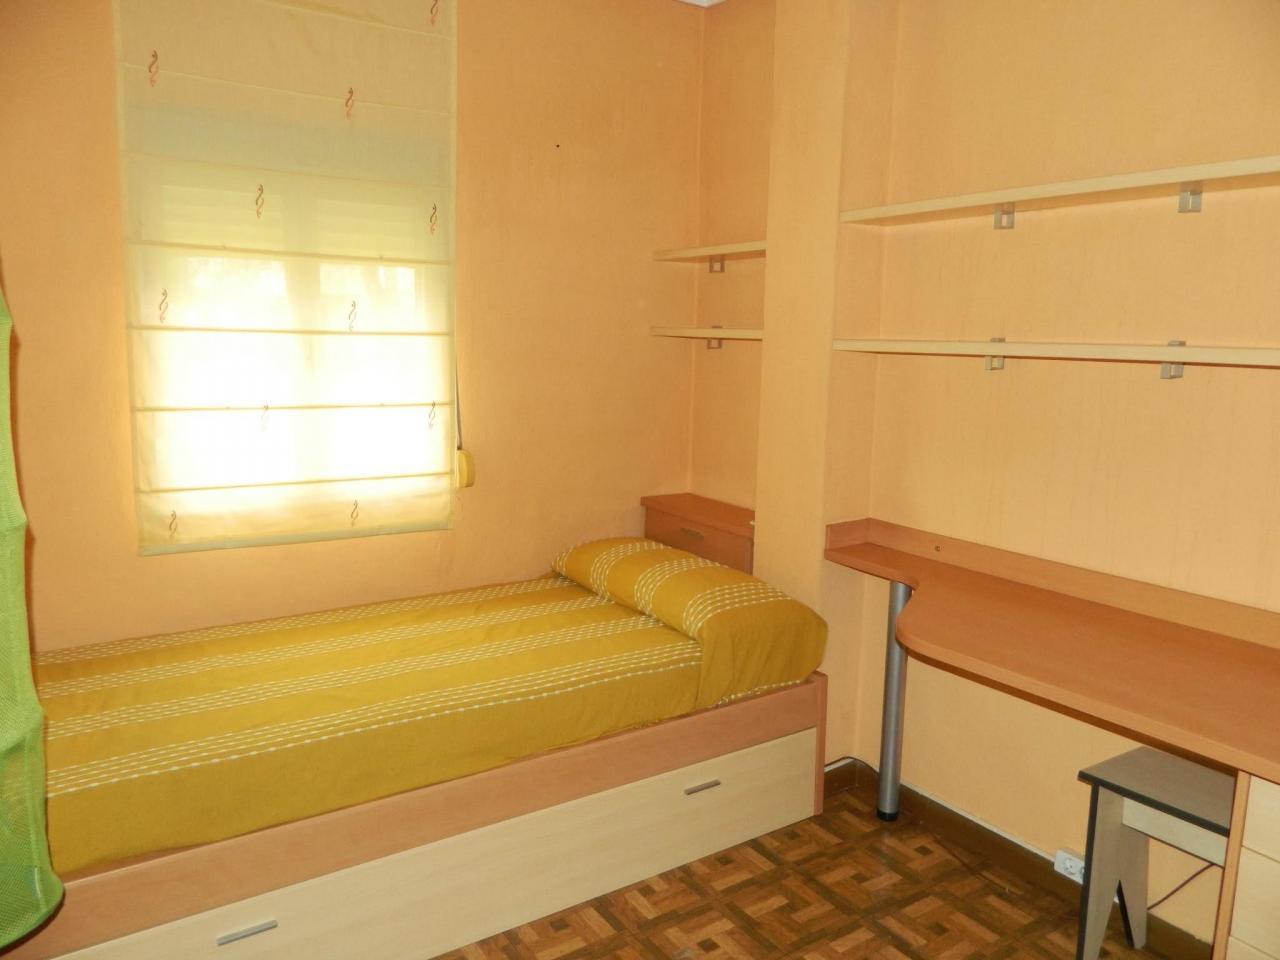 Alquiler apartamento playa Zarautz, Guipúzcoa